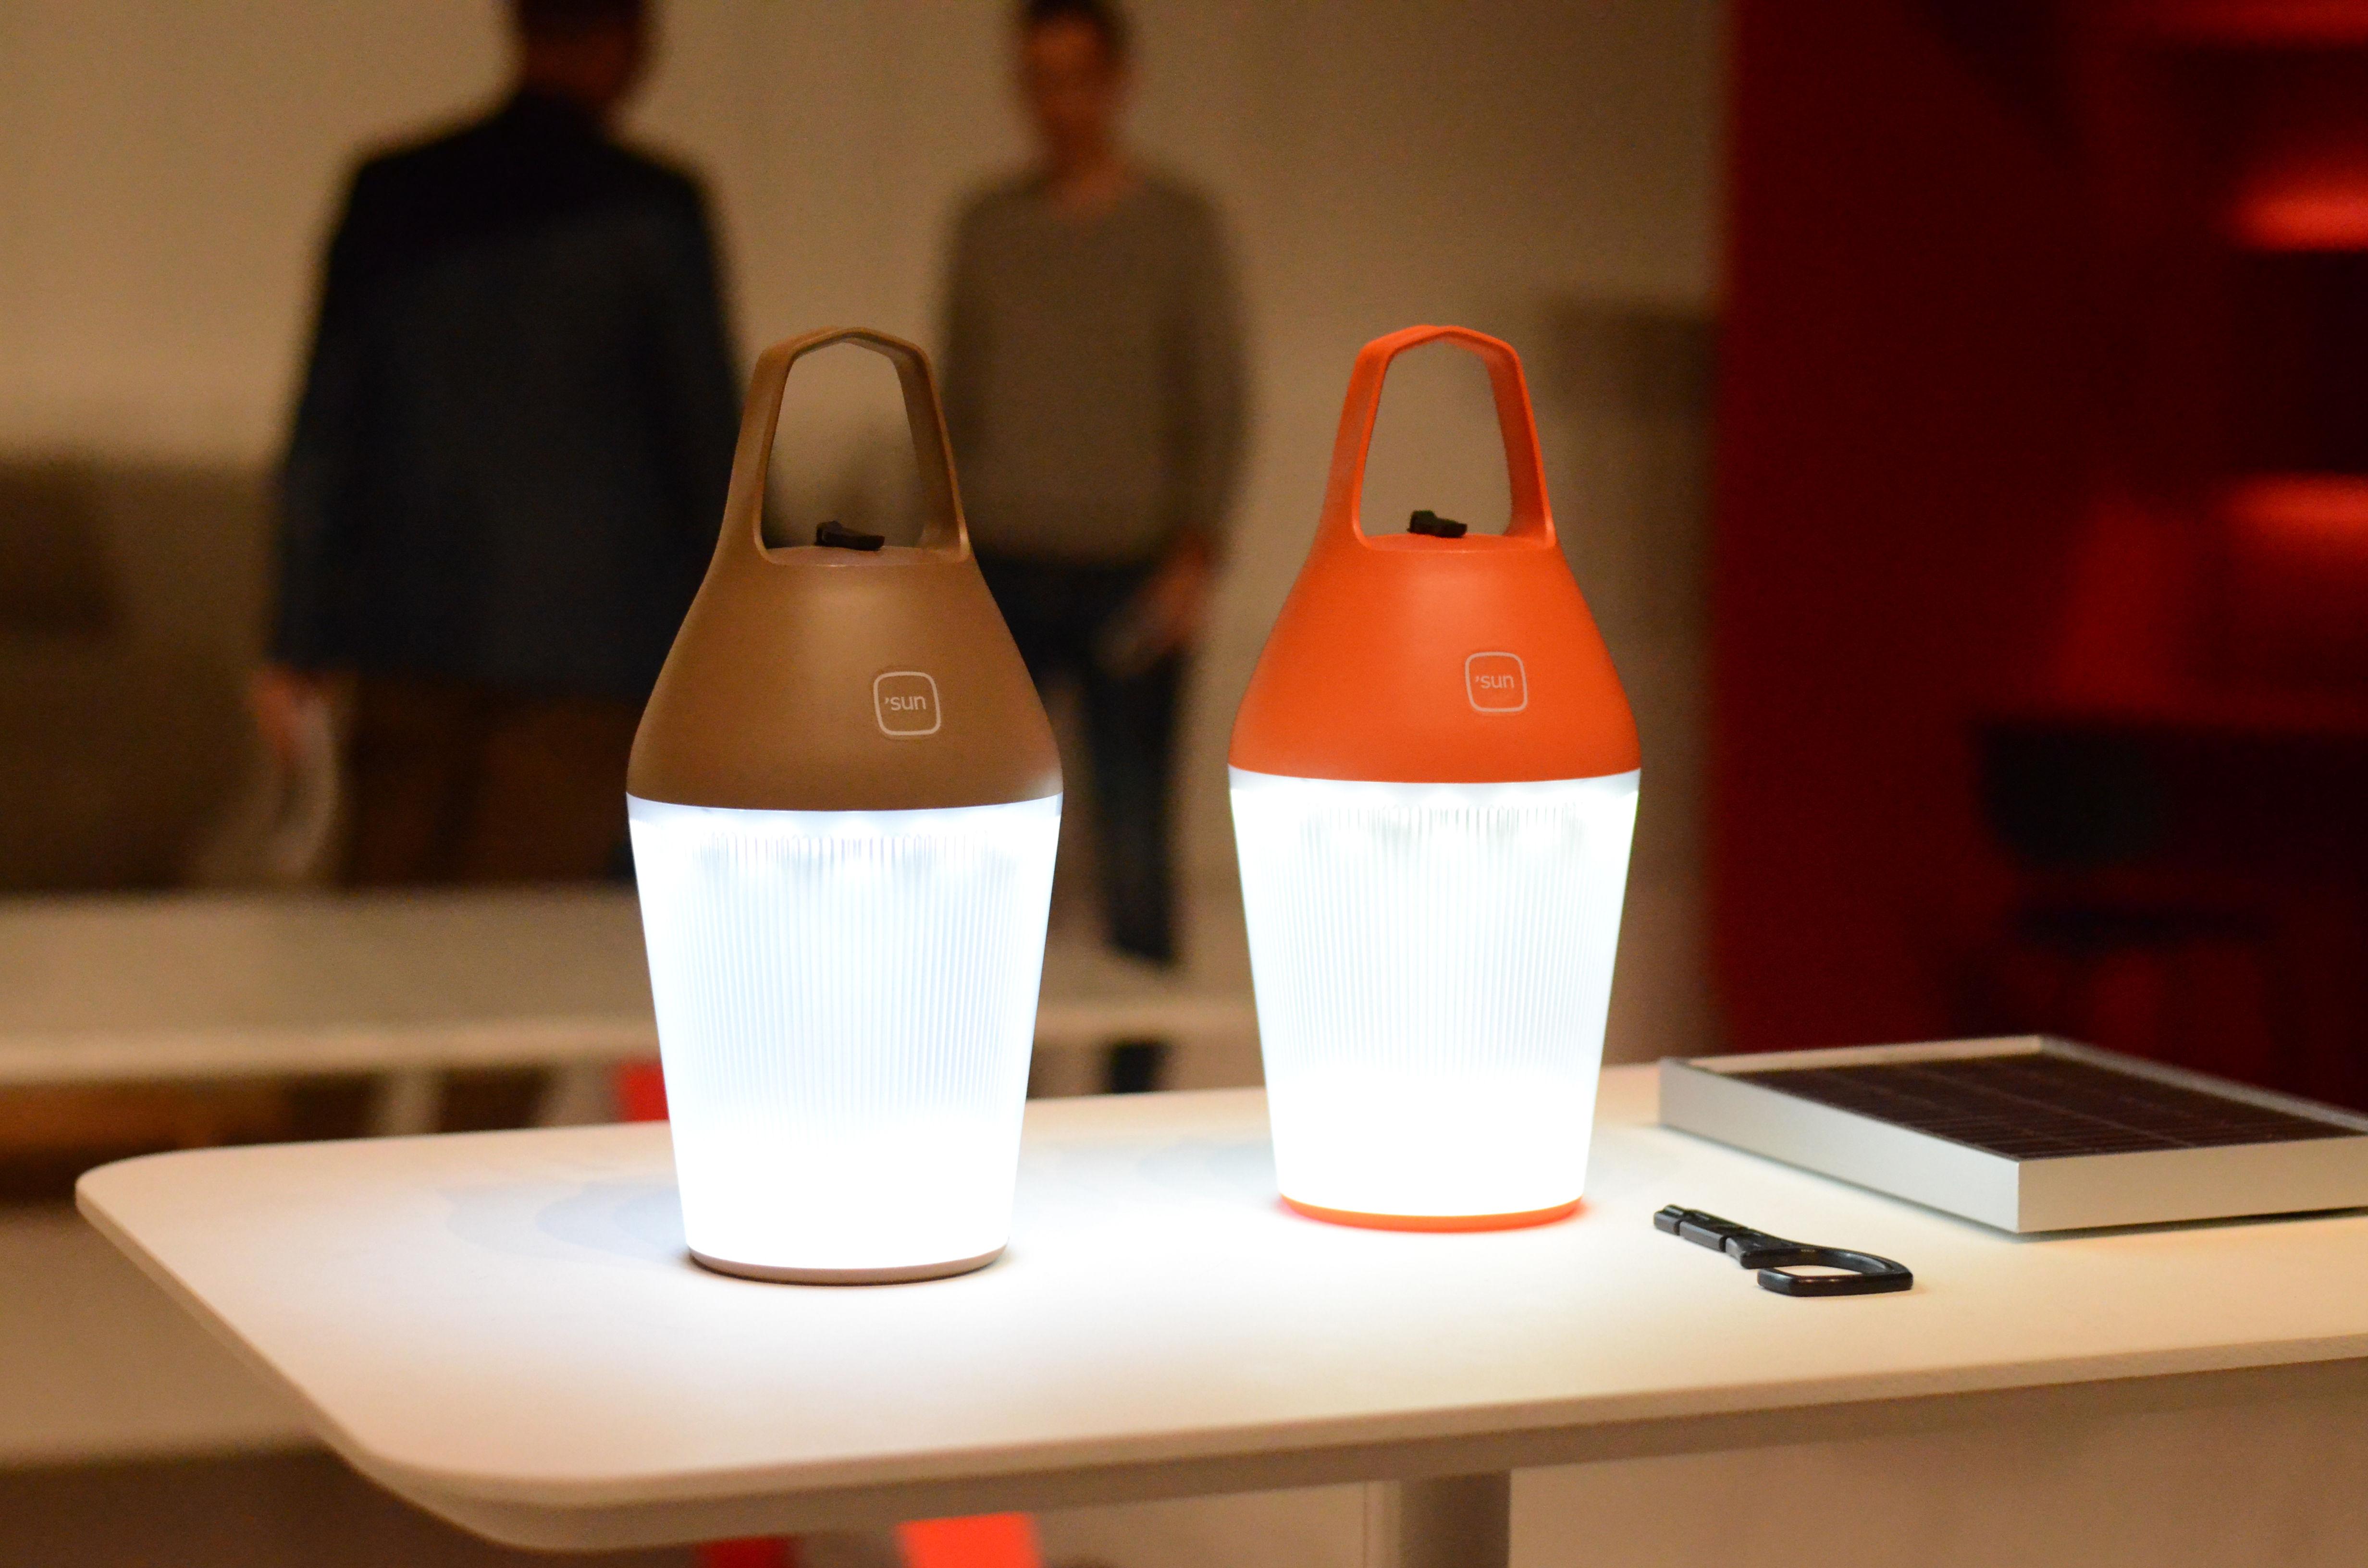 lampe solaire nomad sans fil ambre o 39 sun made in design. Black Bedroom Furniture Sets. Home Design Ideas